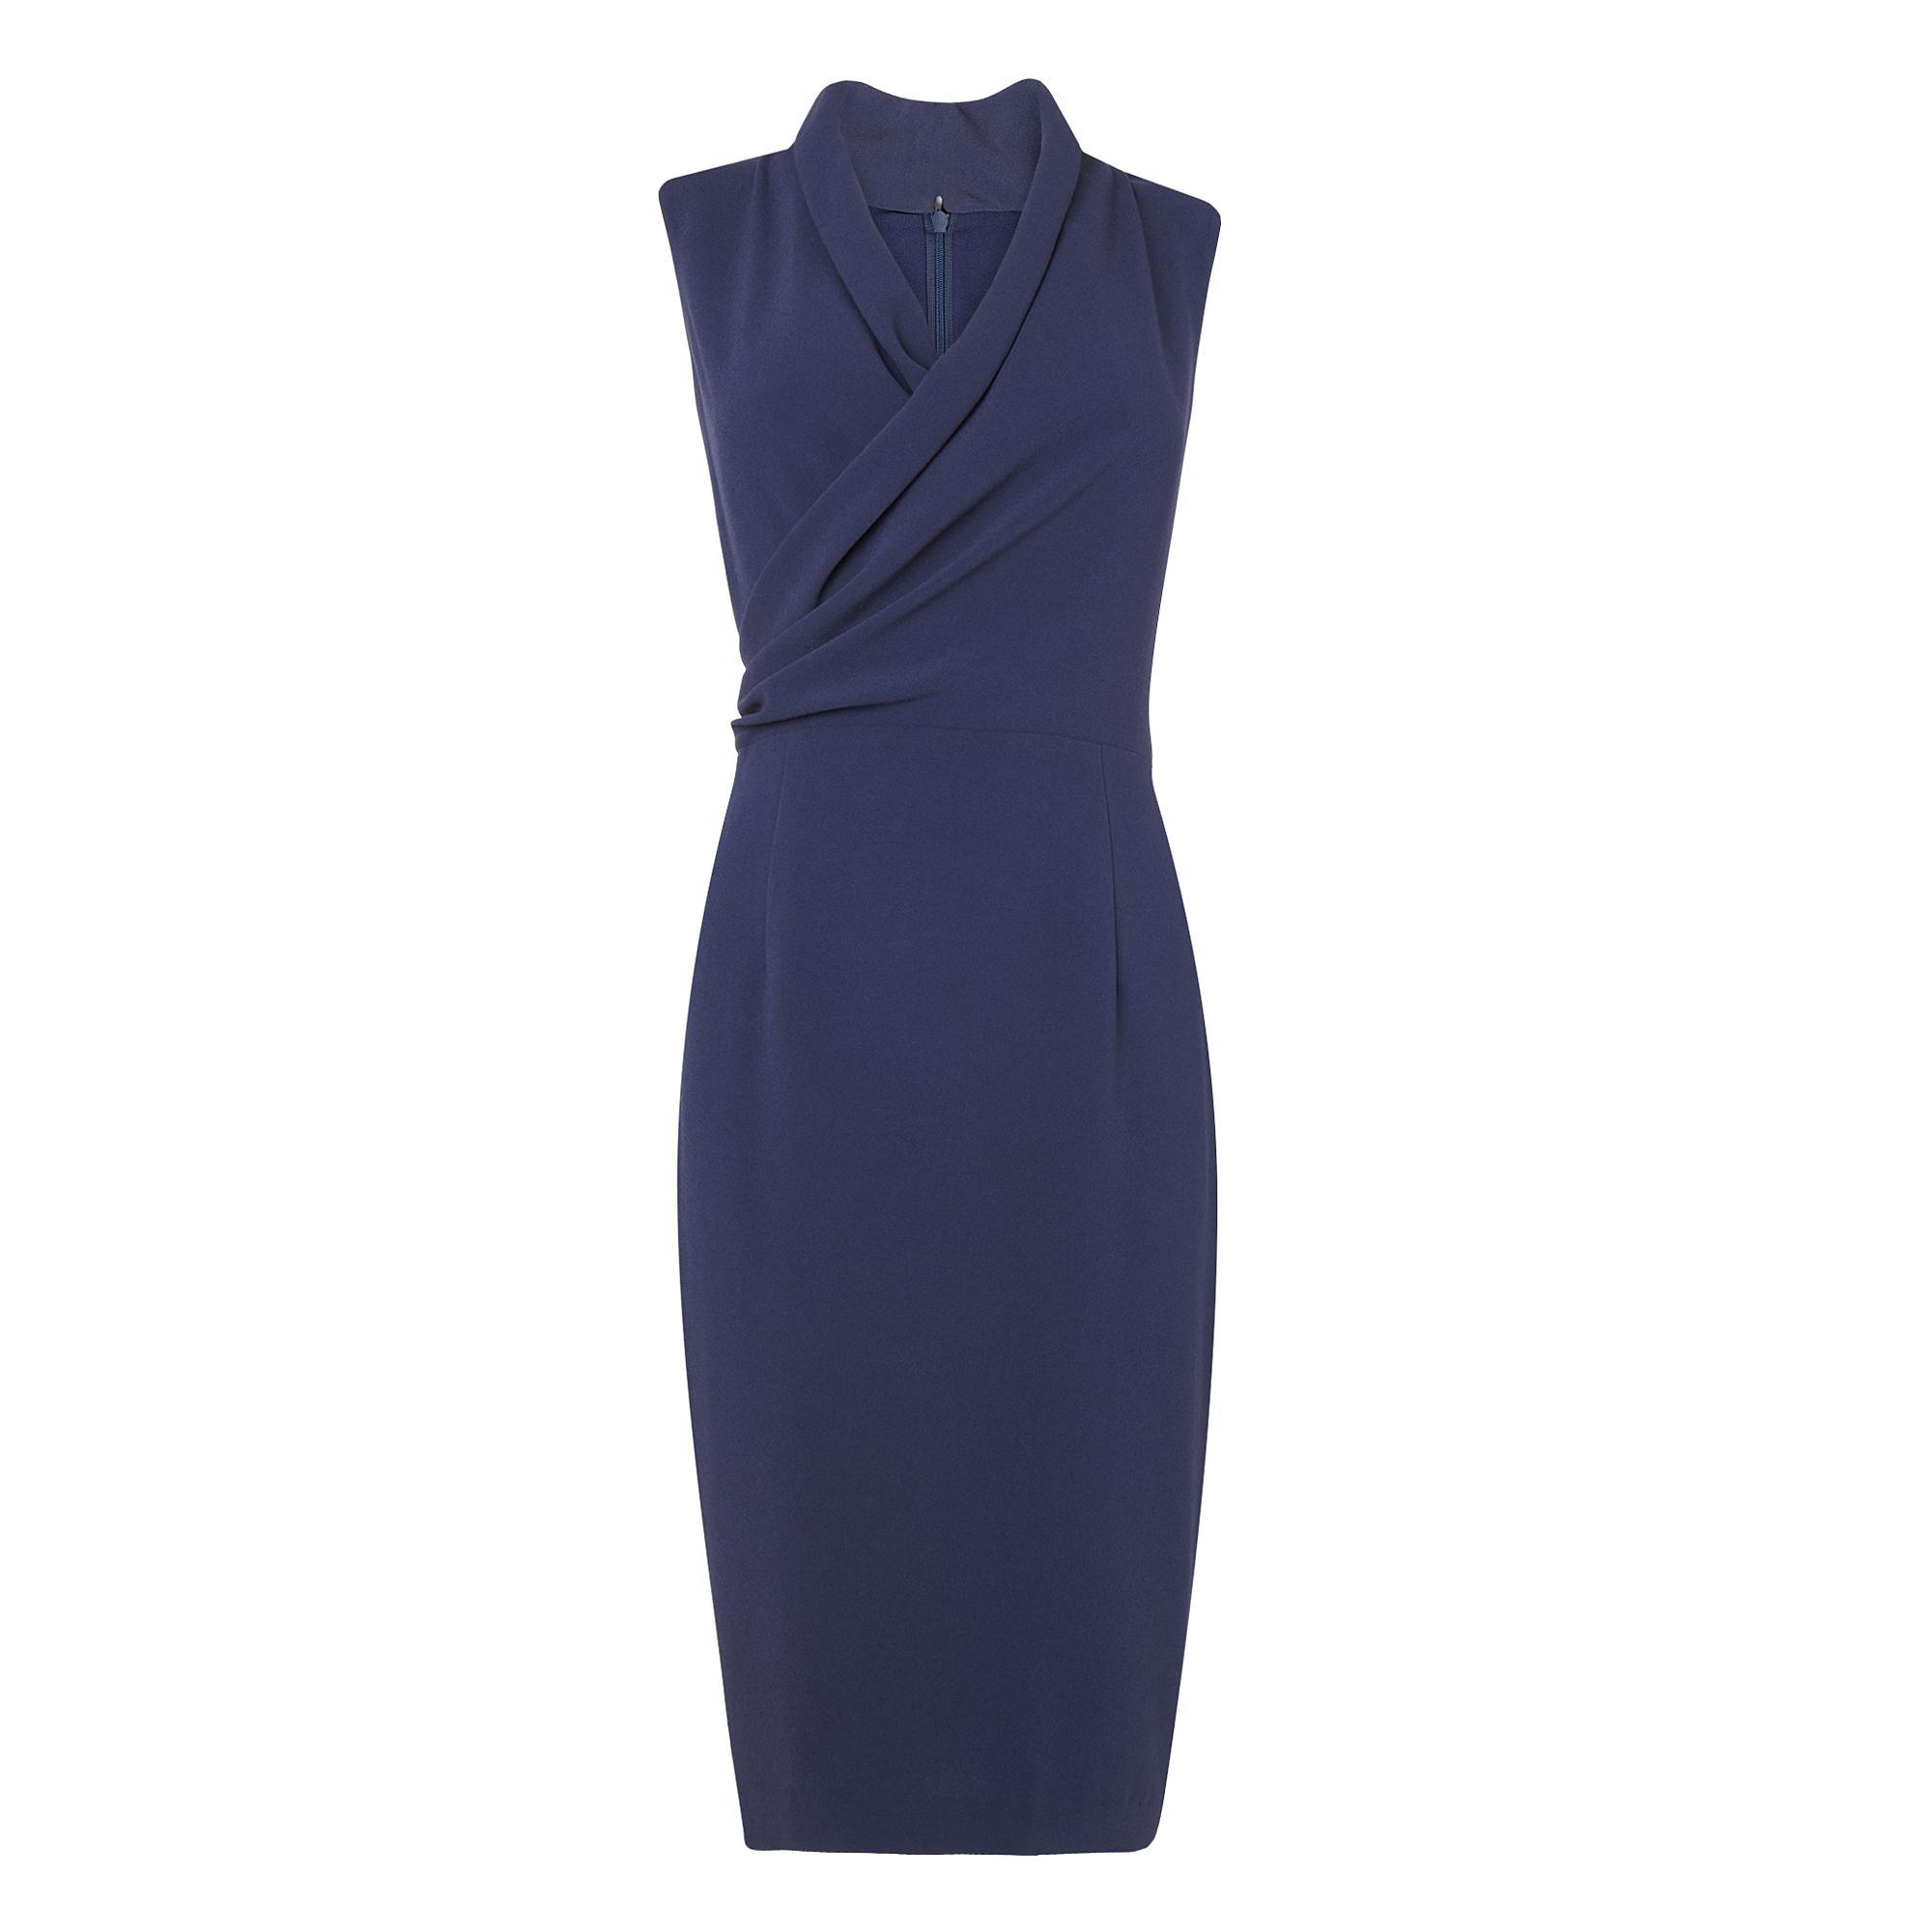 4c820890bc3bf Lamar Sleeveless Dress